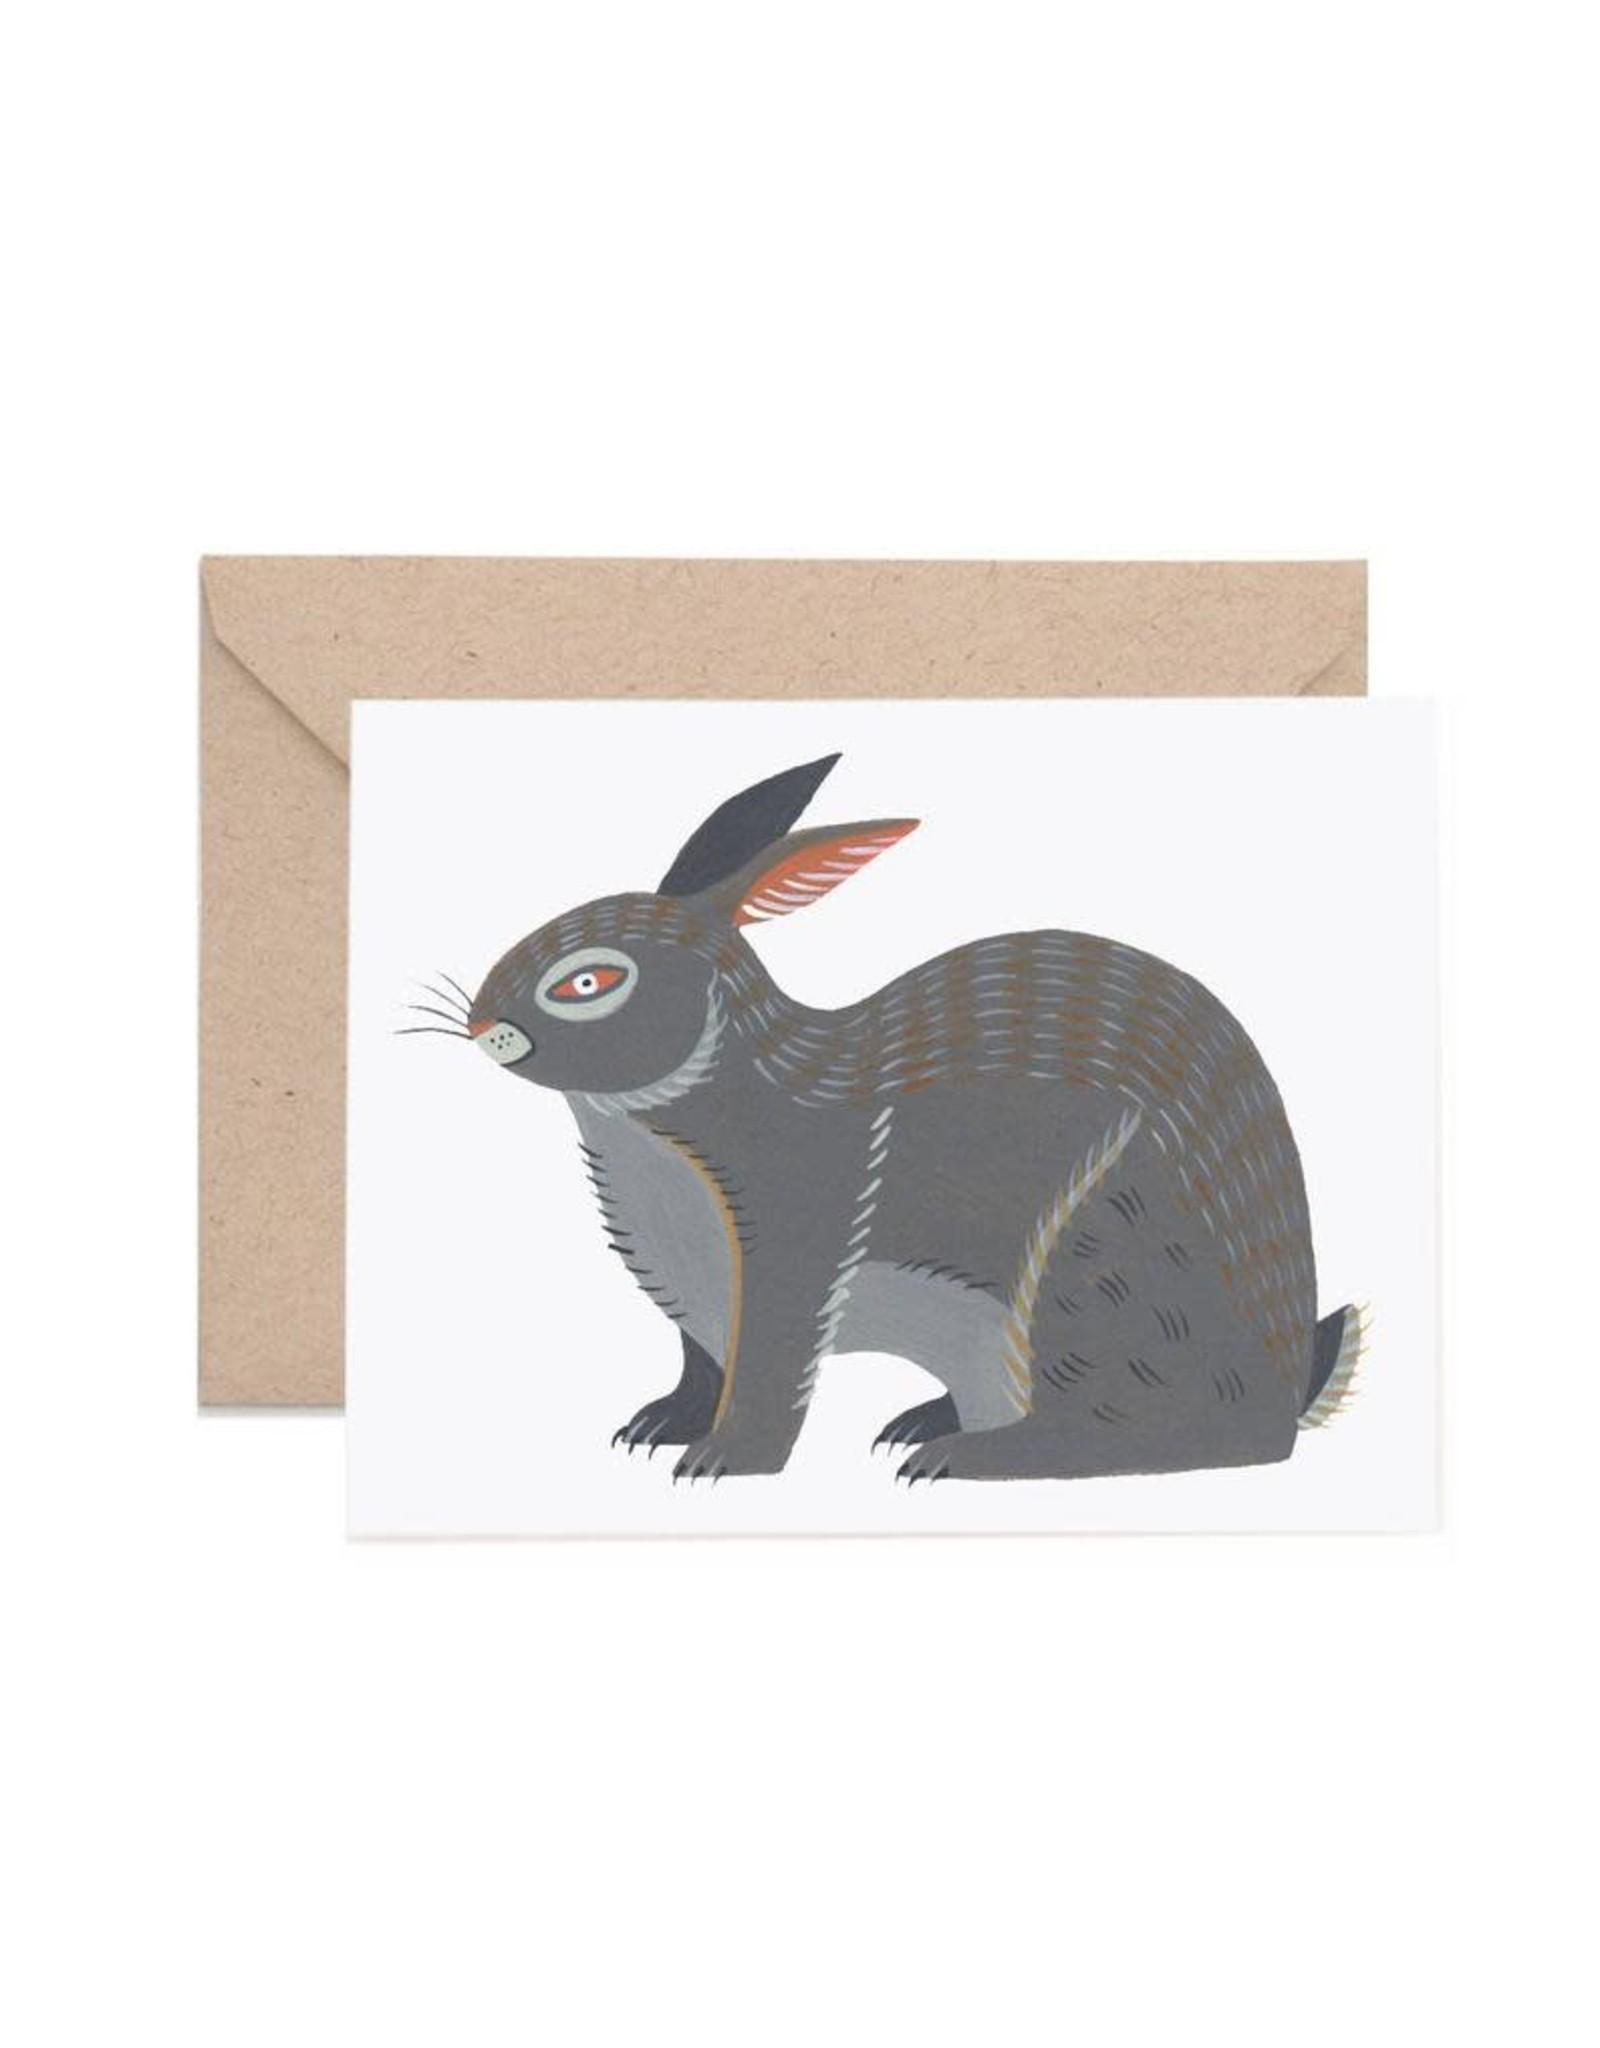 Lisa Vanin Notecard, Rabbit